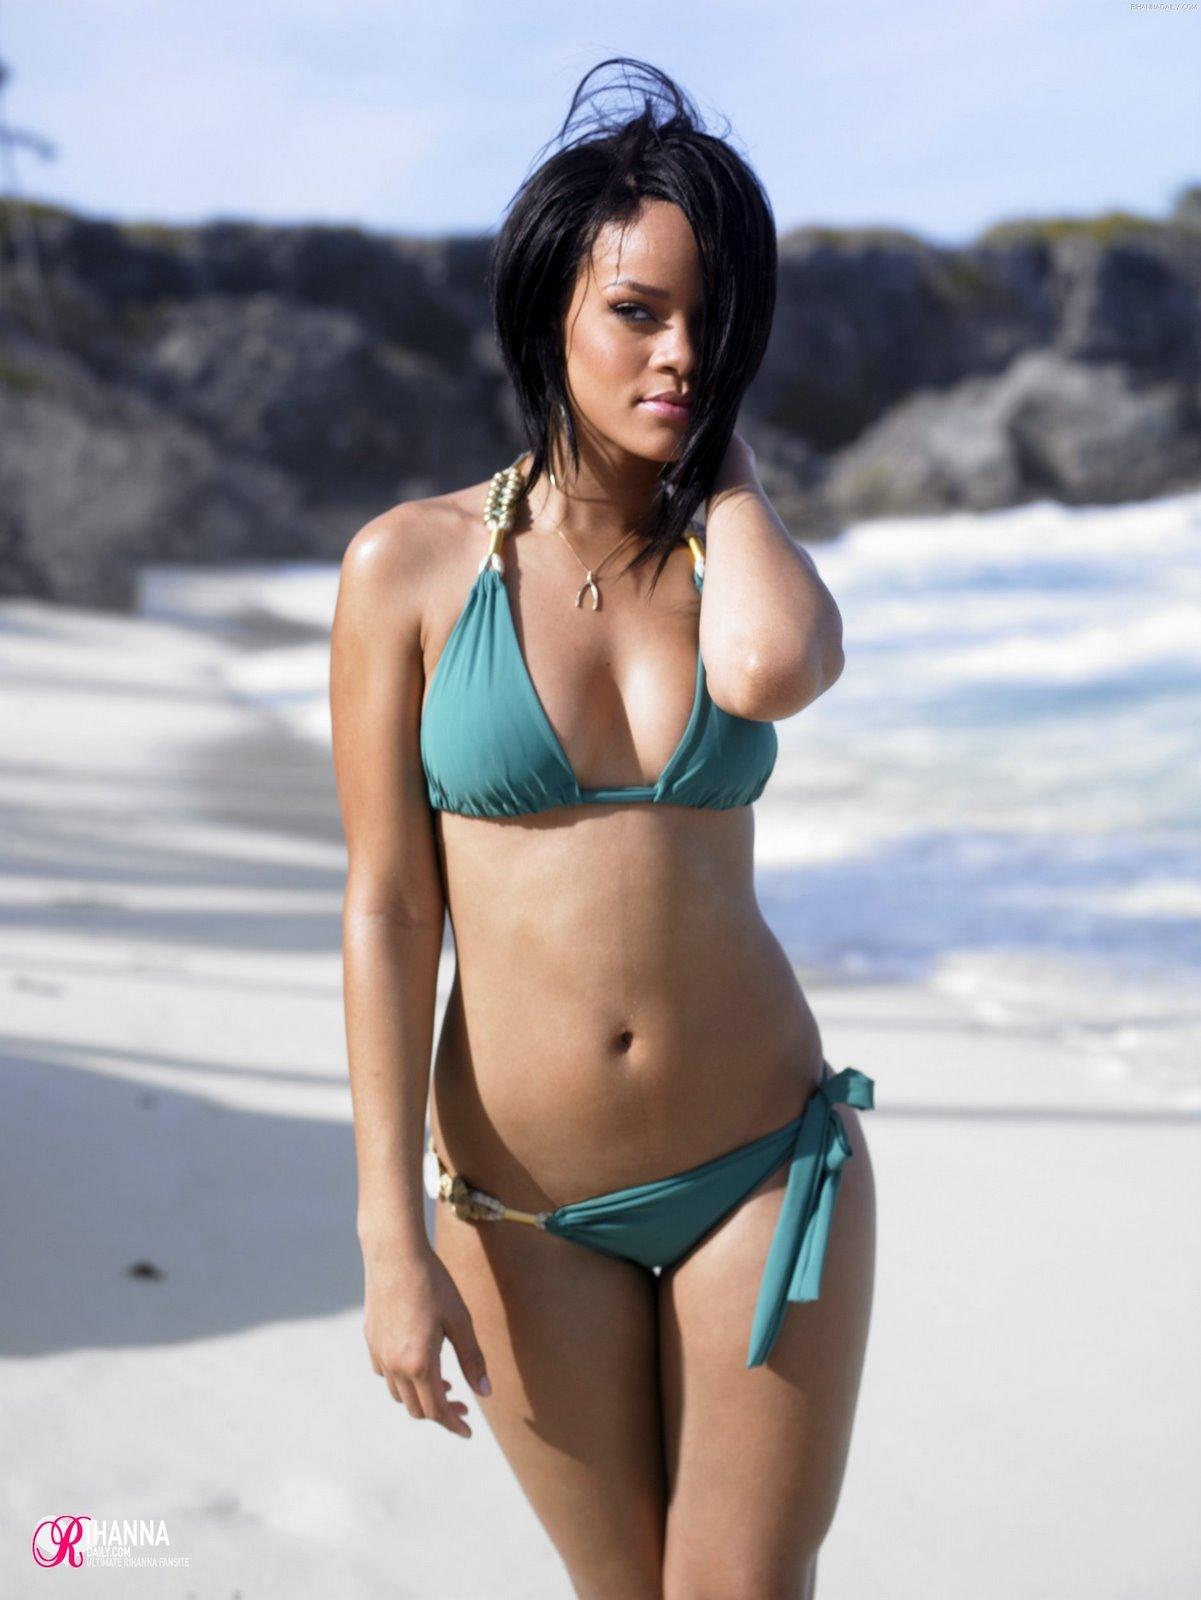 http://3.bp.blogspot.com/_sH7fLNOqRFE/TEr38BMK7XI/AAAAAAAACIo/_SRe4csbitM/s1600/Rihanna%2B(1).jpg